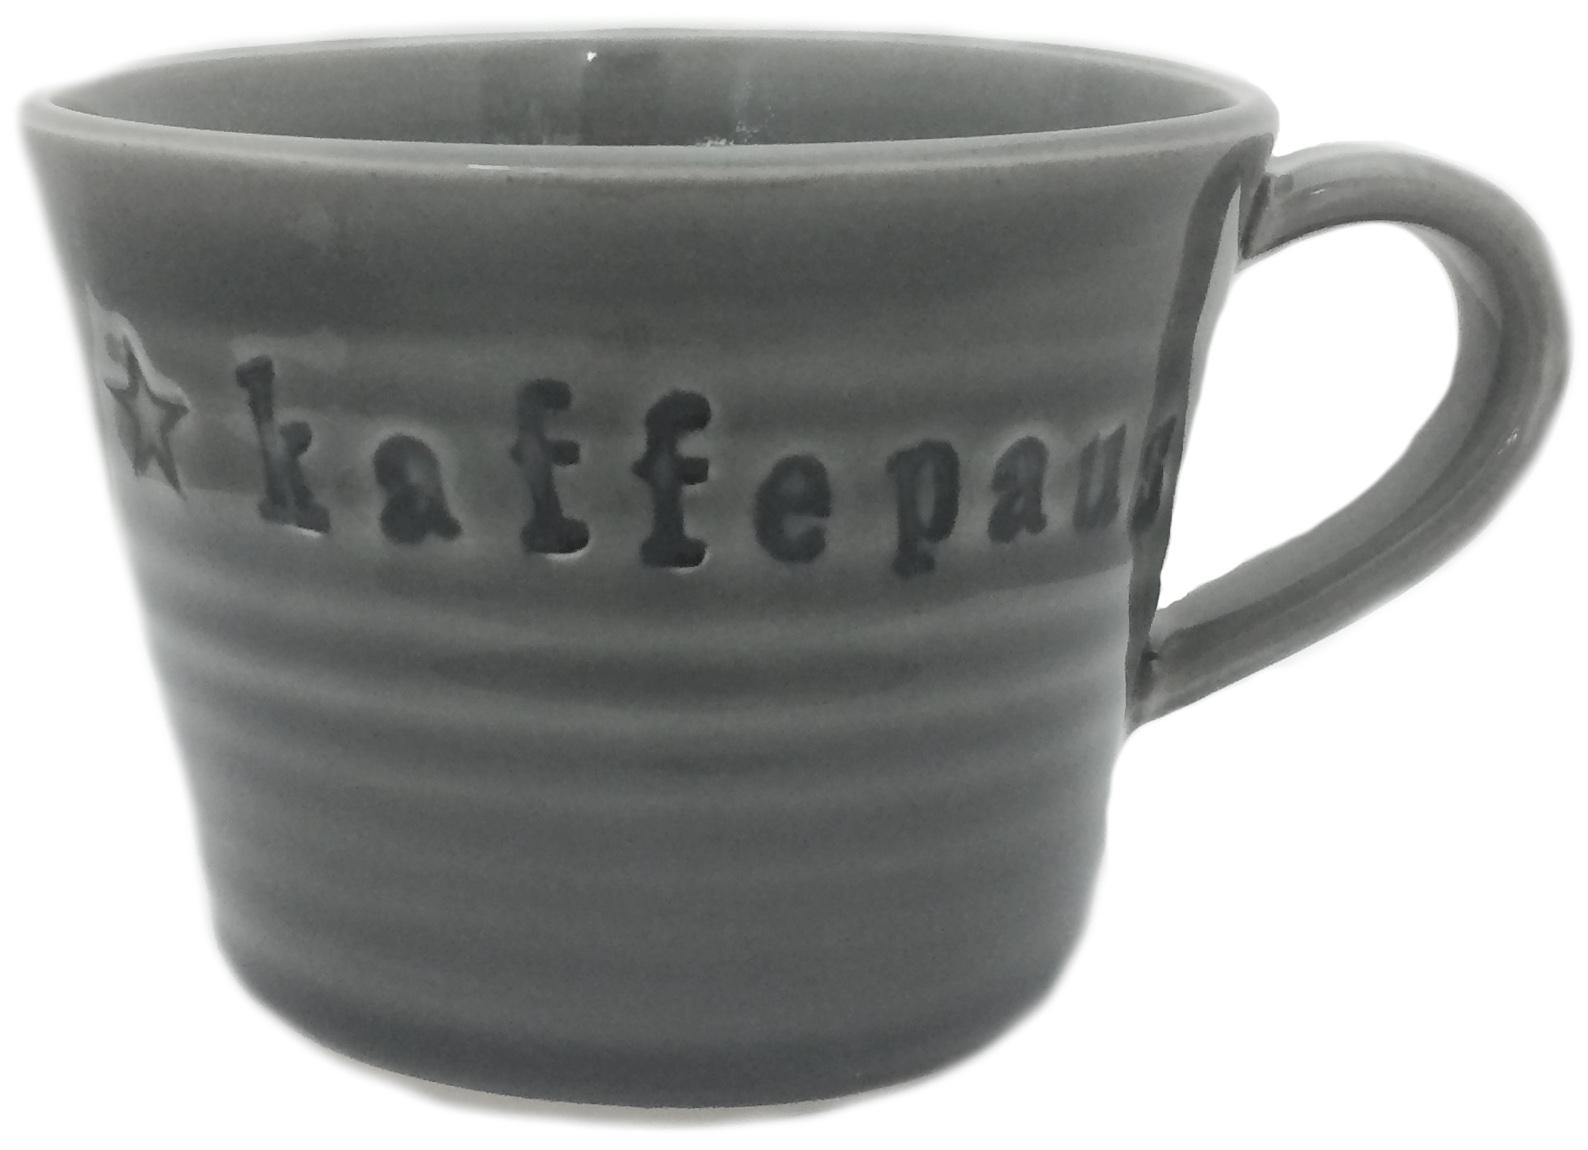 Mugg Kaffepaus - Puss Puss Company • Pryloteket